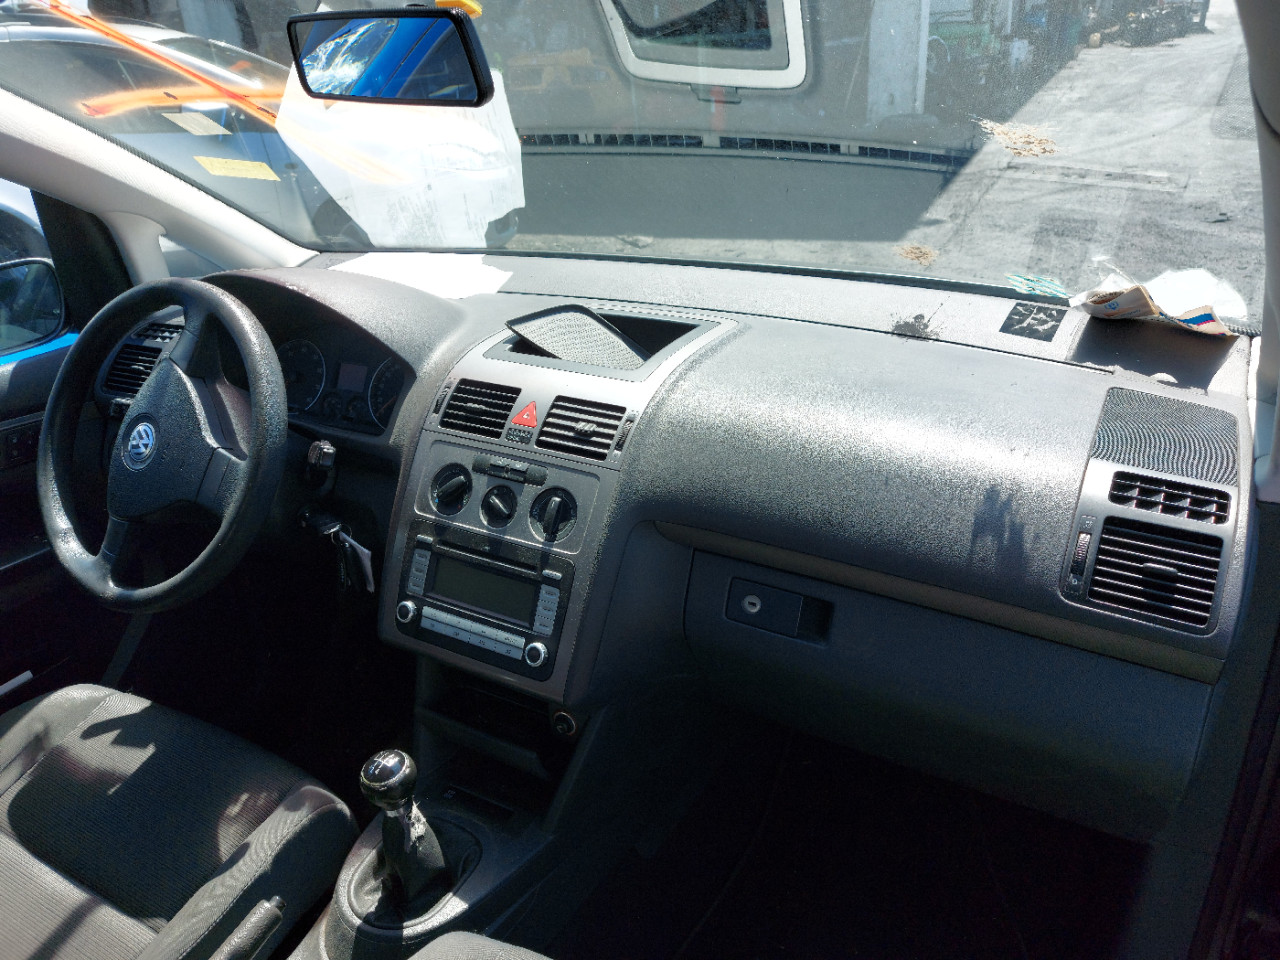 Volkswagen Touran facelift 1.4 tip BSX , cutie tip KLK